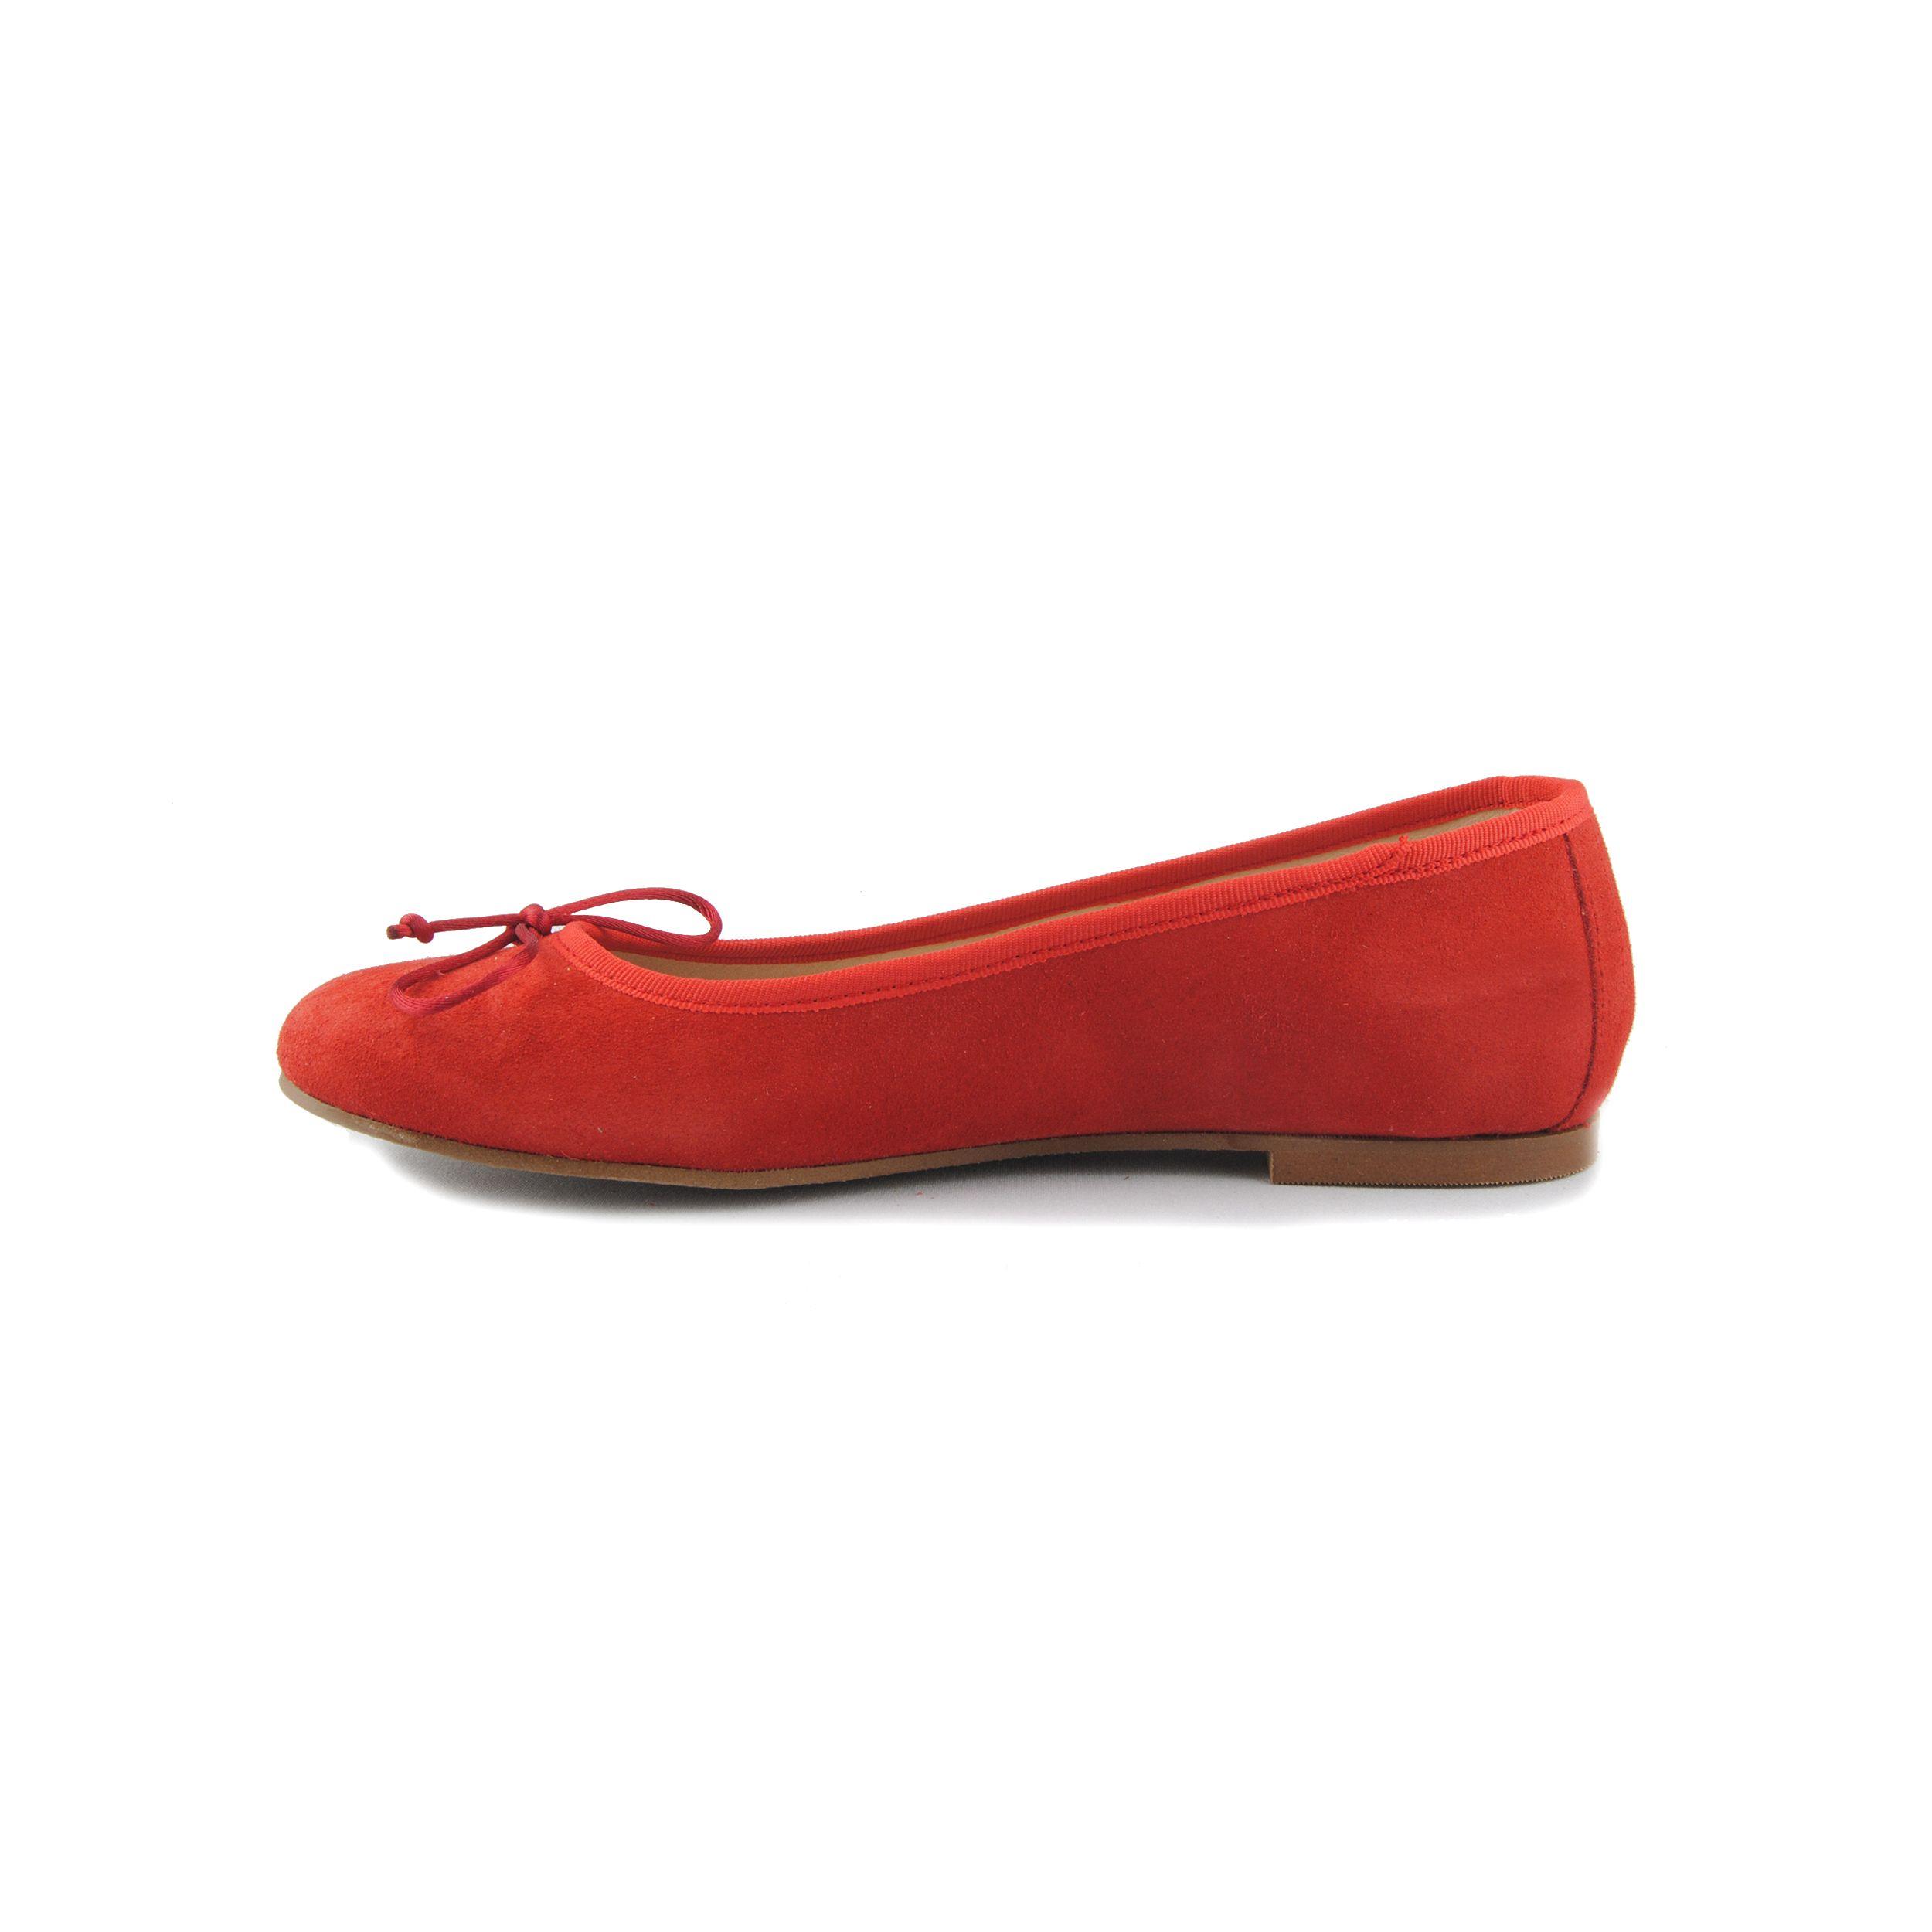 Purapiel Ballet Flat in Red